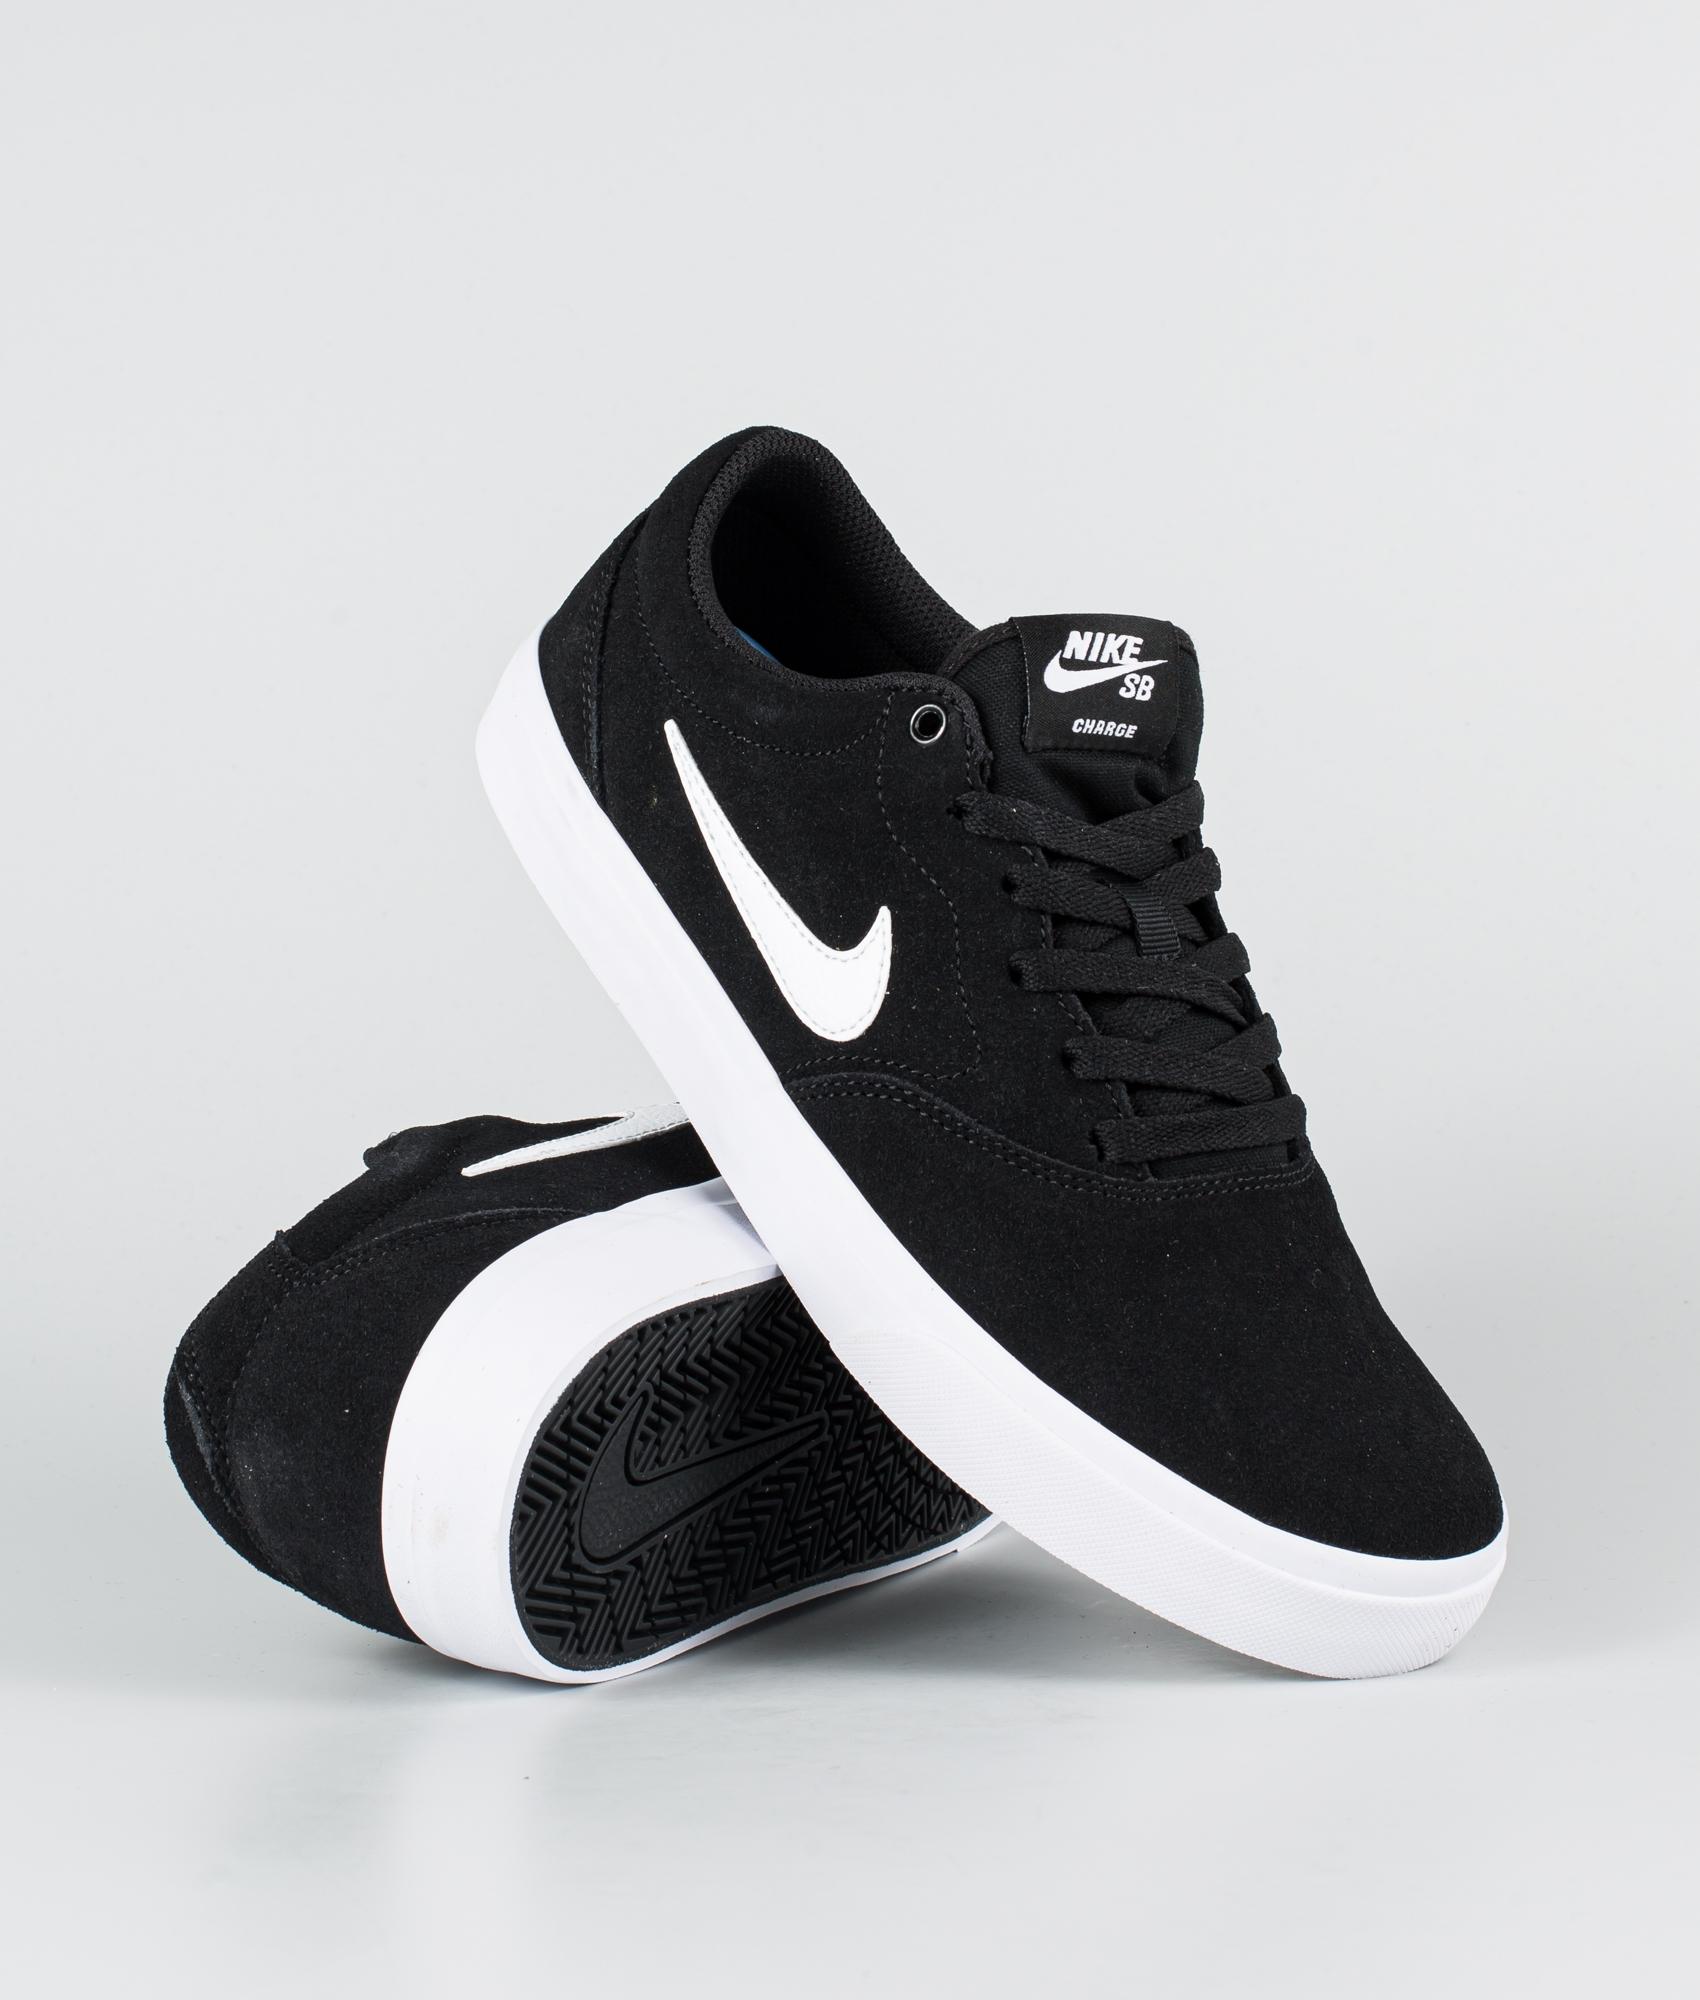 Nike SB Charge suede Chaussures Black/White-Black   Ridestore.com